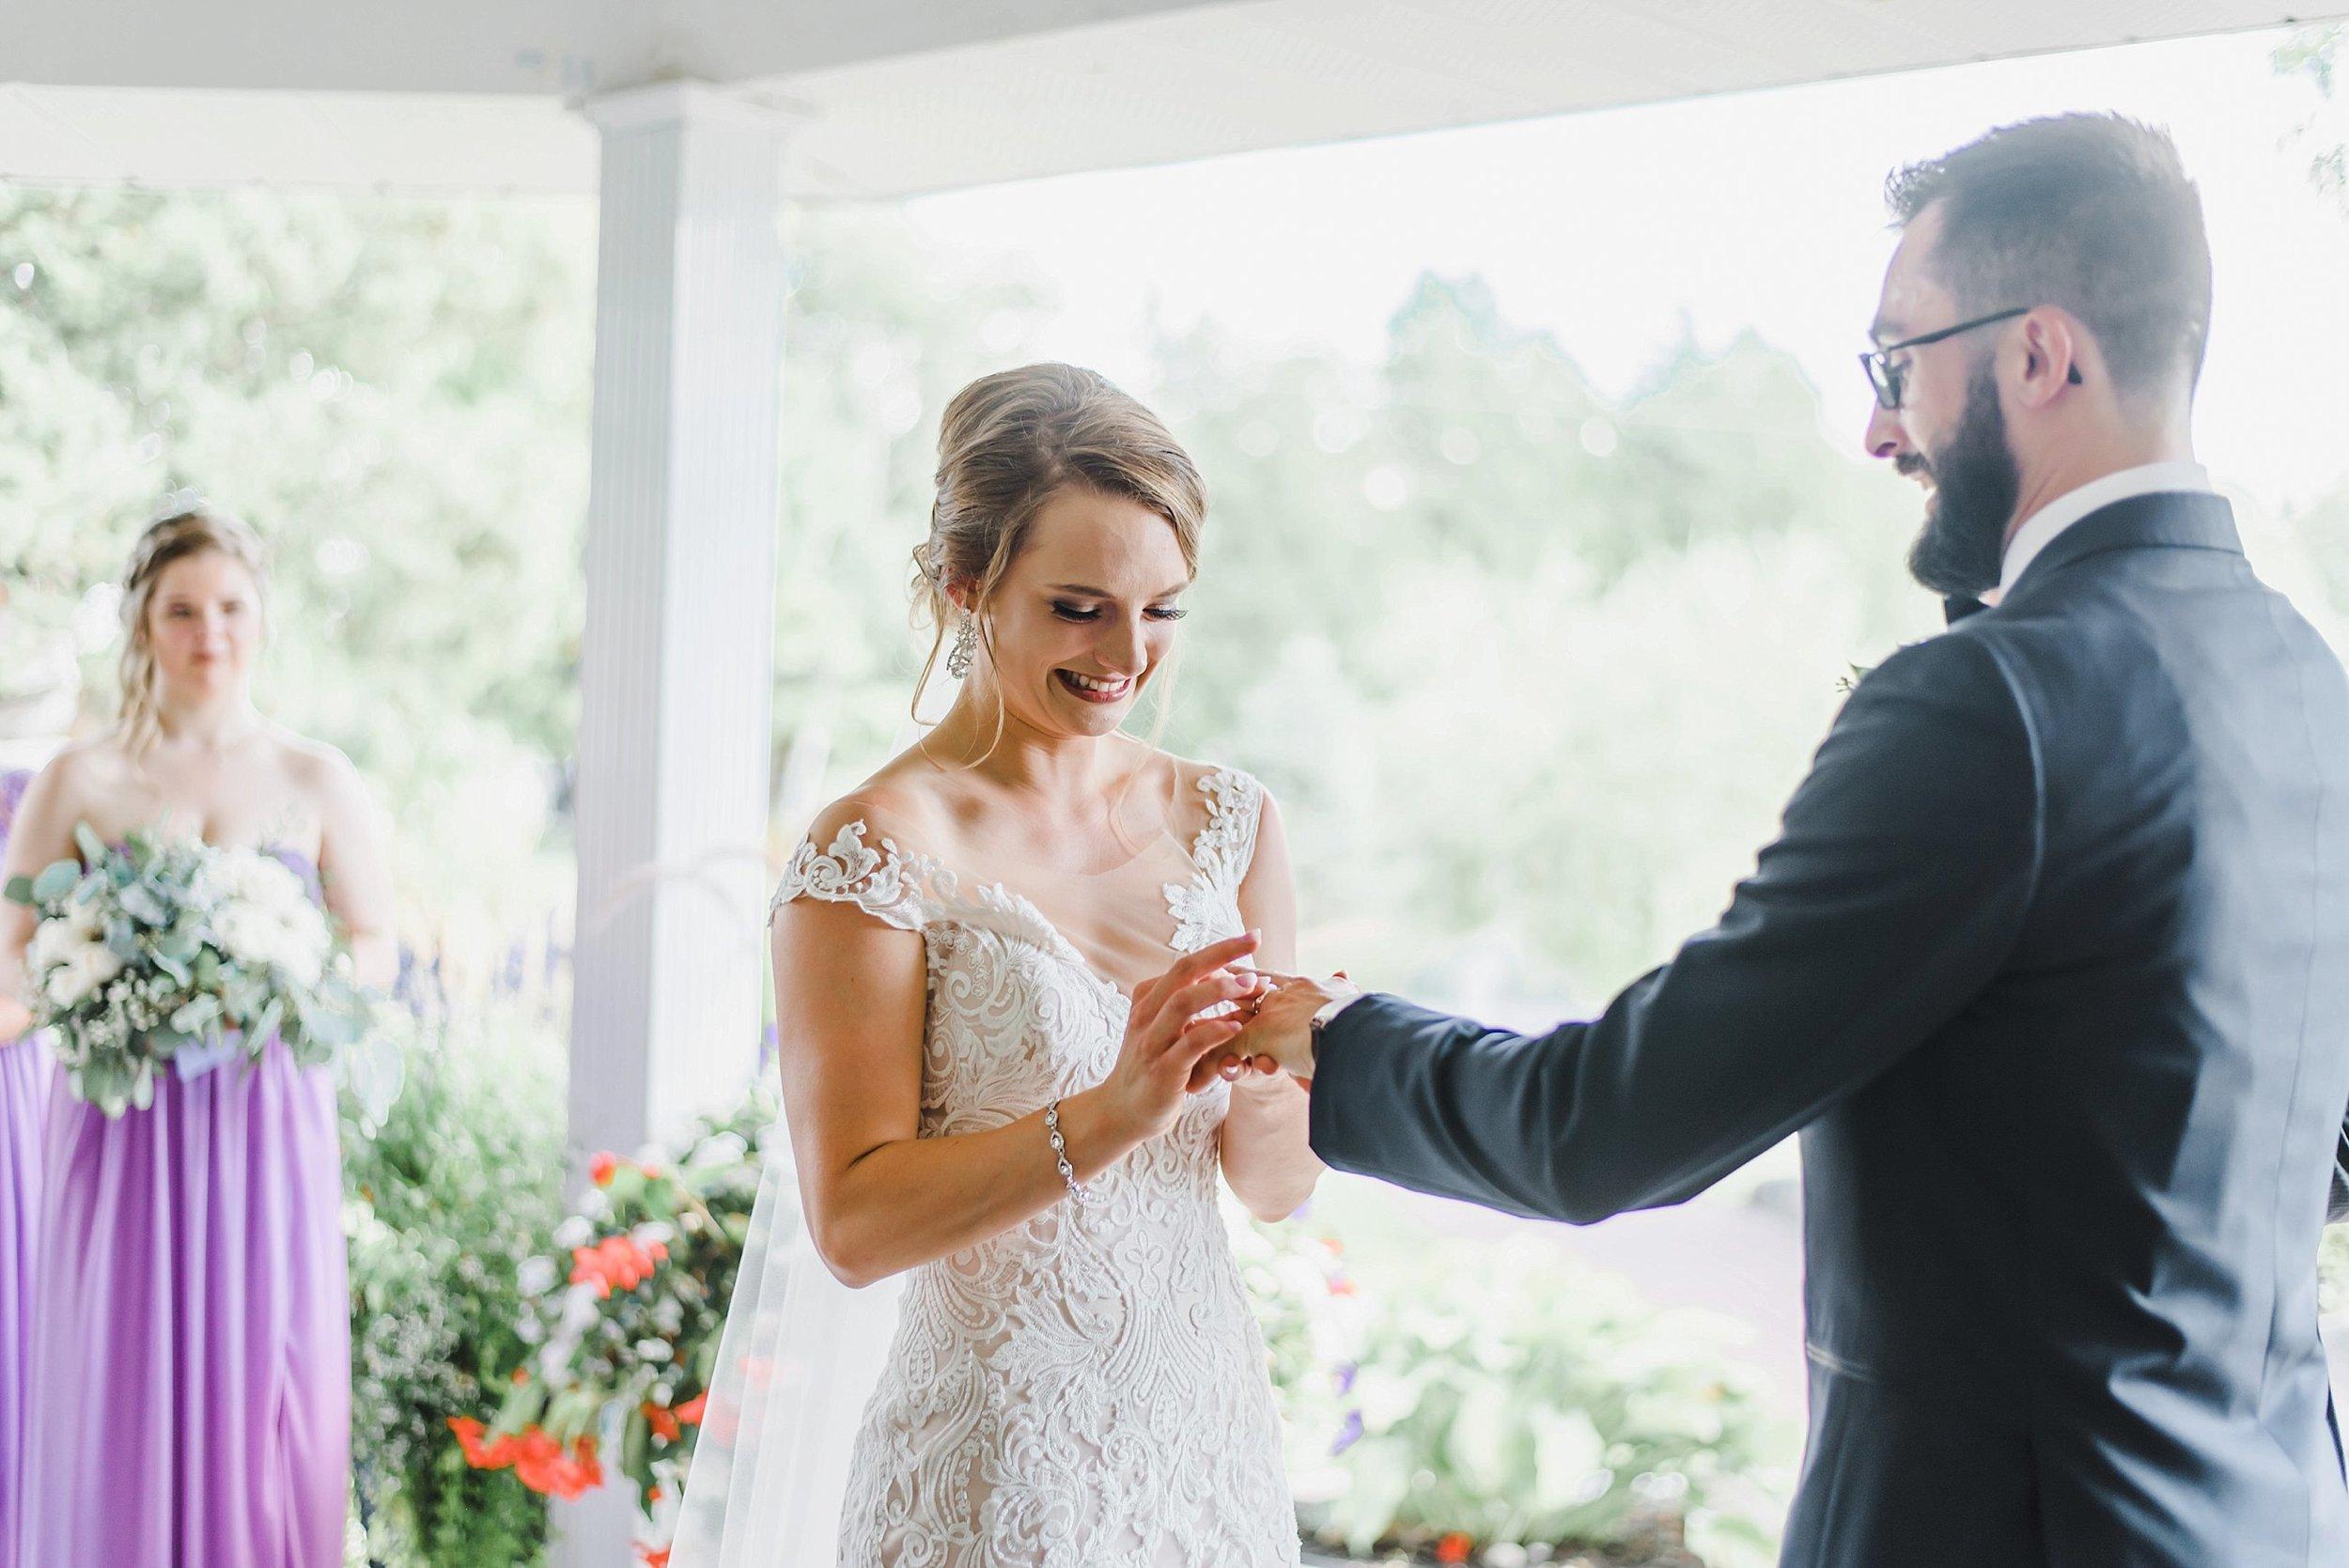 light airy indie fine art ottawa wedding photographer | Ali and Batoul Photography_1277.jpg